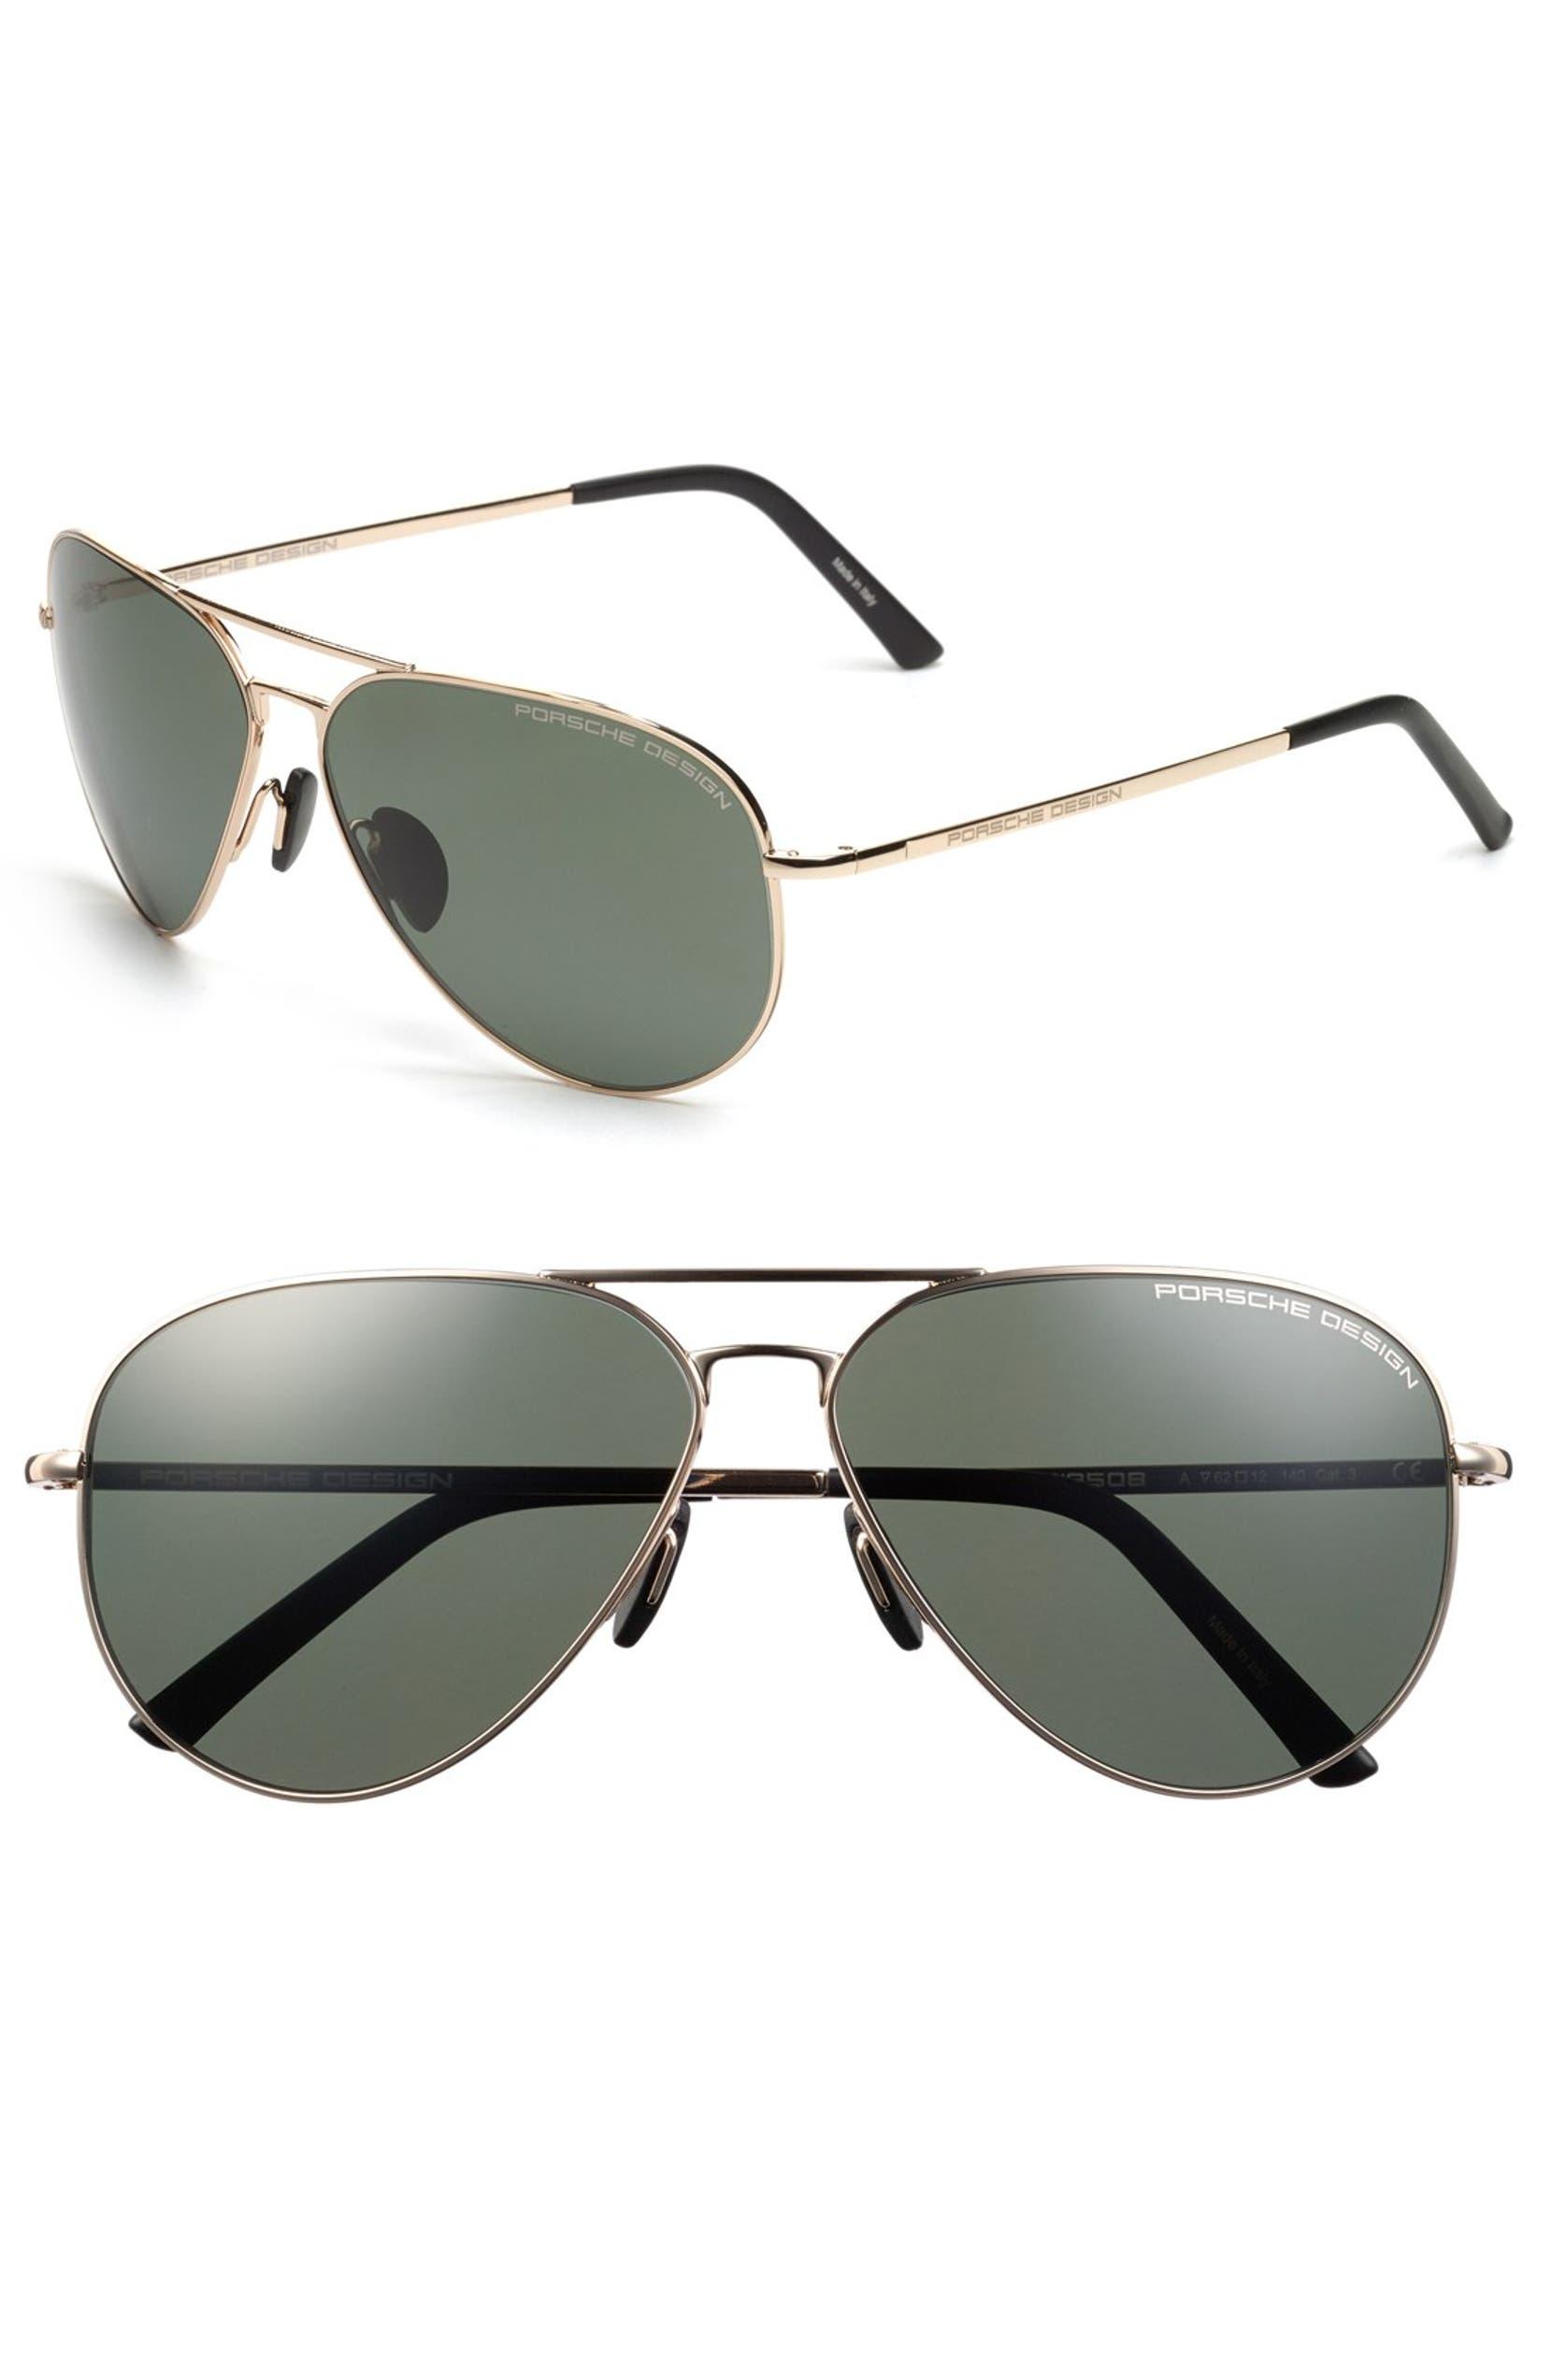 2b63f026ffc Porsche Design  P8508  62mm Polarized Aviator Sunglasses